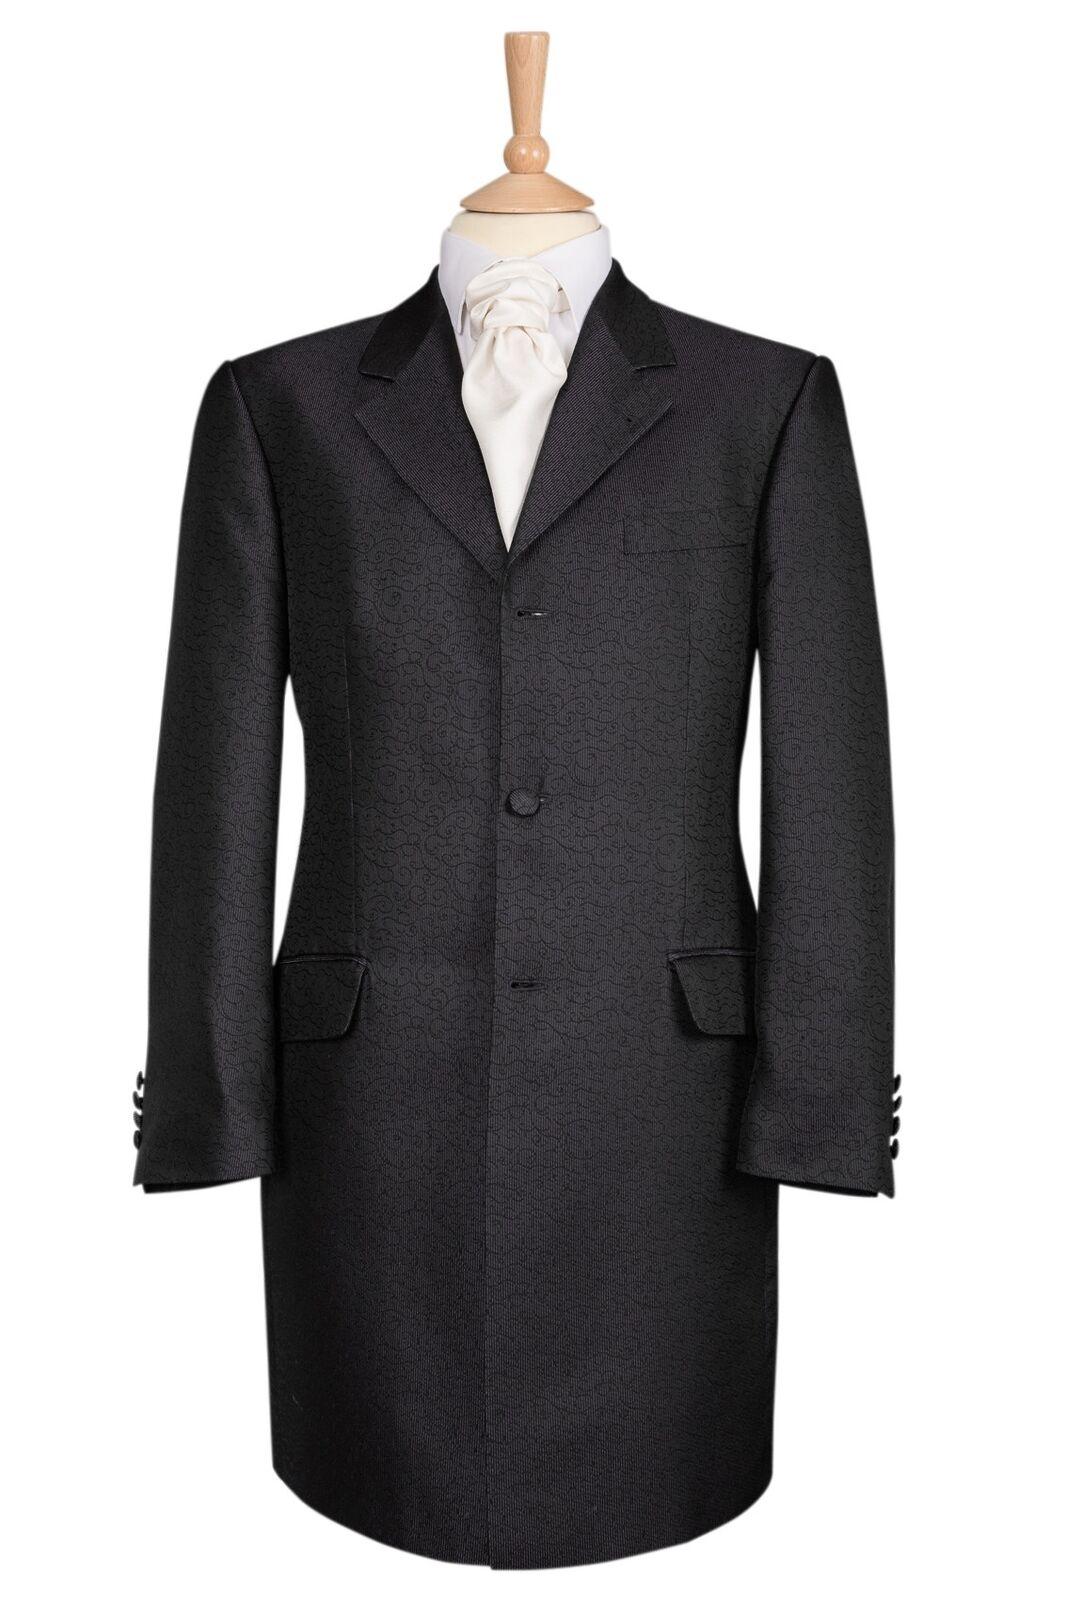 Grey Swirl Pattern Prince Edward Jacket - Ex Hire